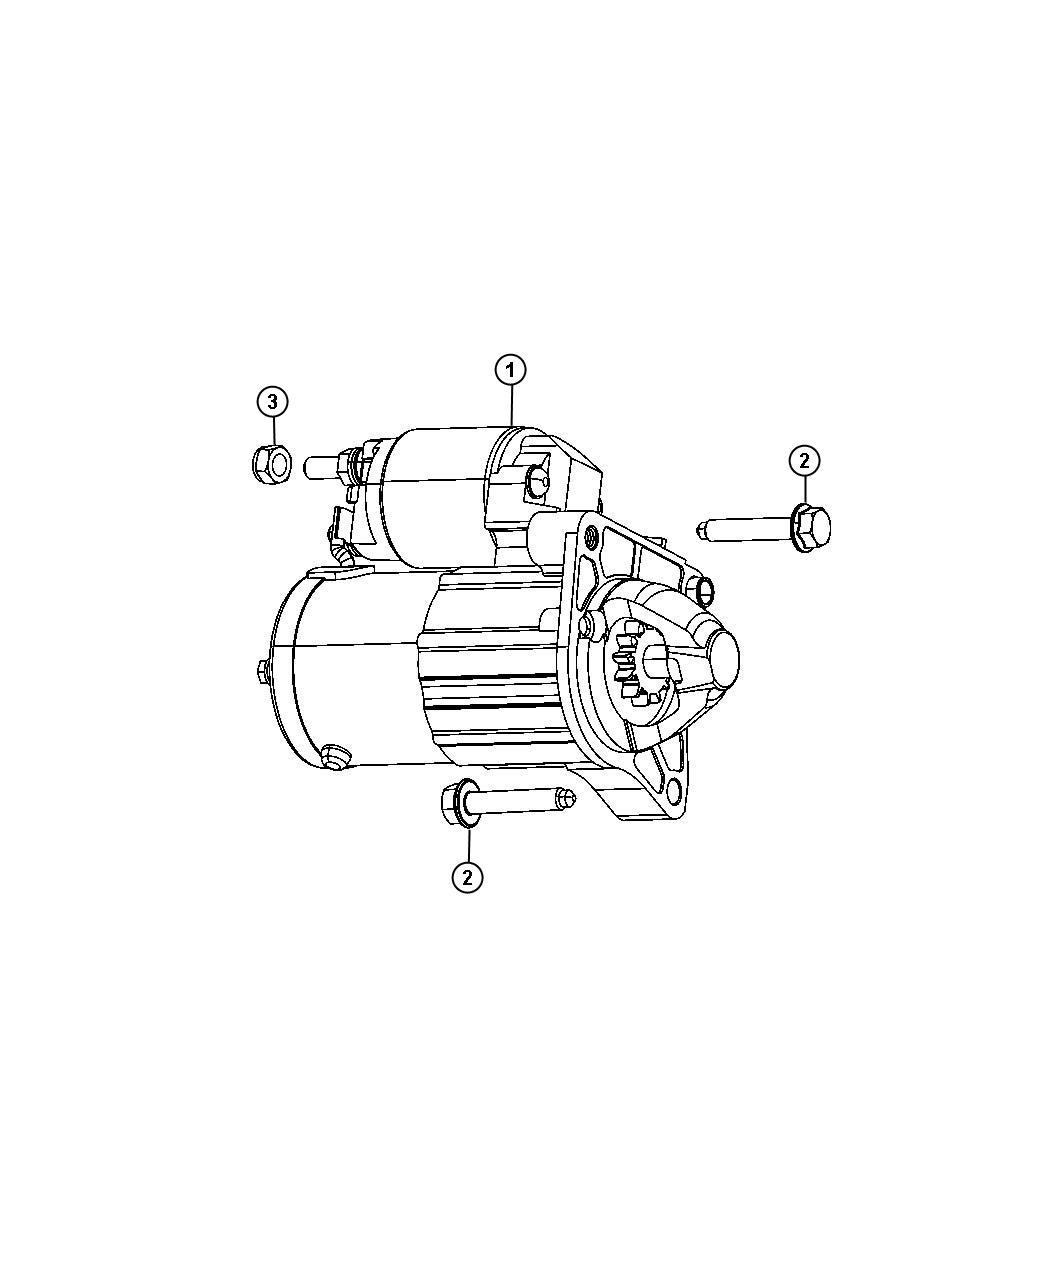 Dodge Dart Nut  Hex  M8x1 25  Alternator Jumper  Battery Wiring To Starter  Starter